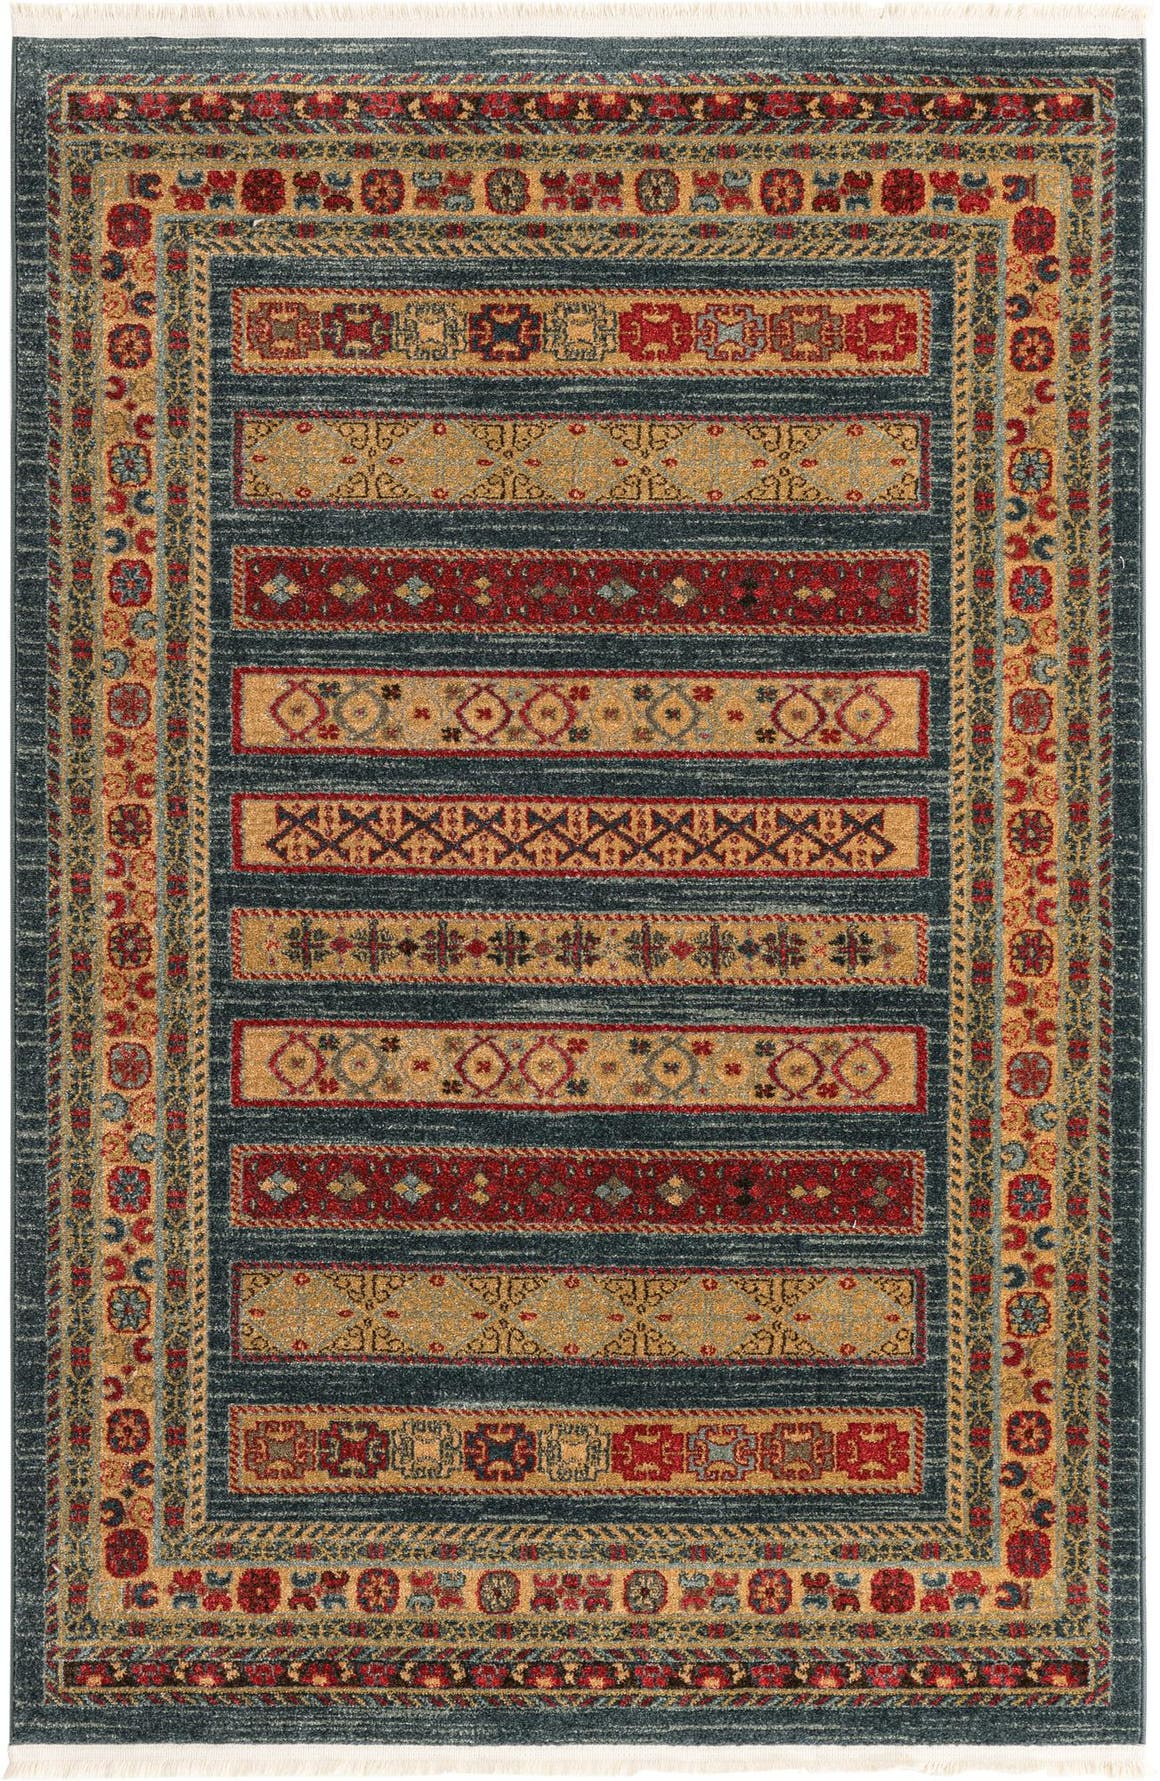 4' x 6' Kashkuli Gabbeh Rug main image